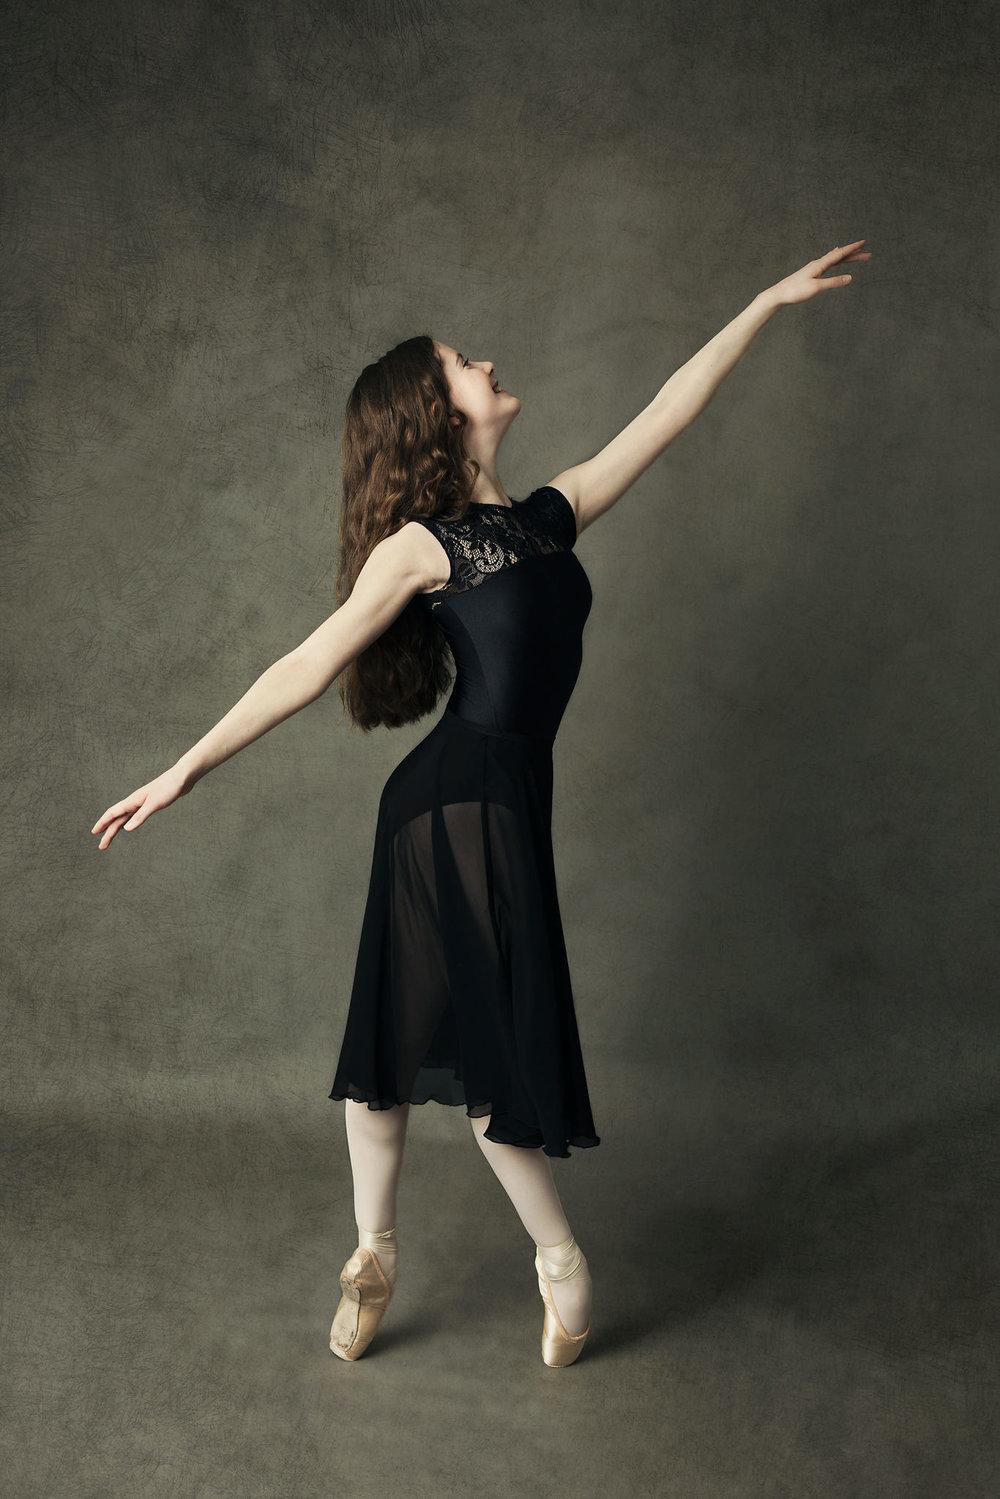 tara_morris_ballet_photography_uk_london_bath03-2.jpg